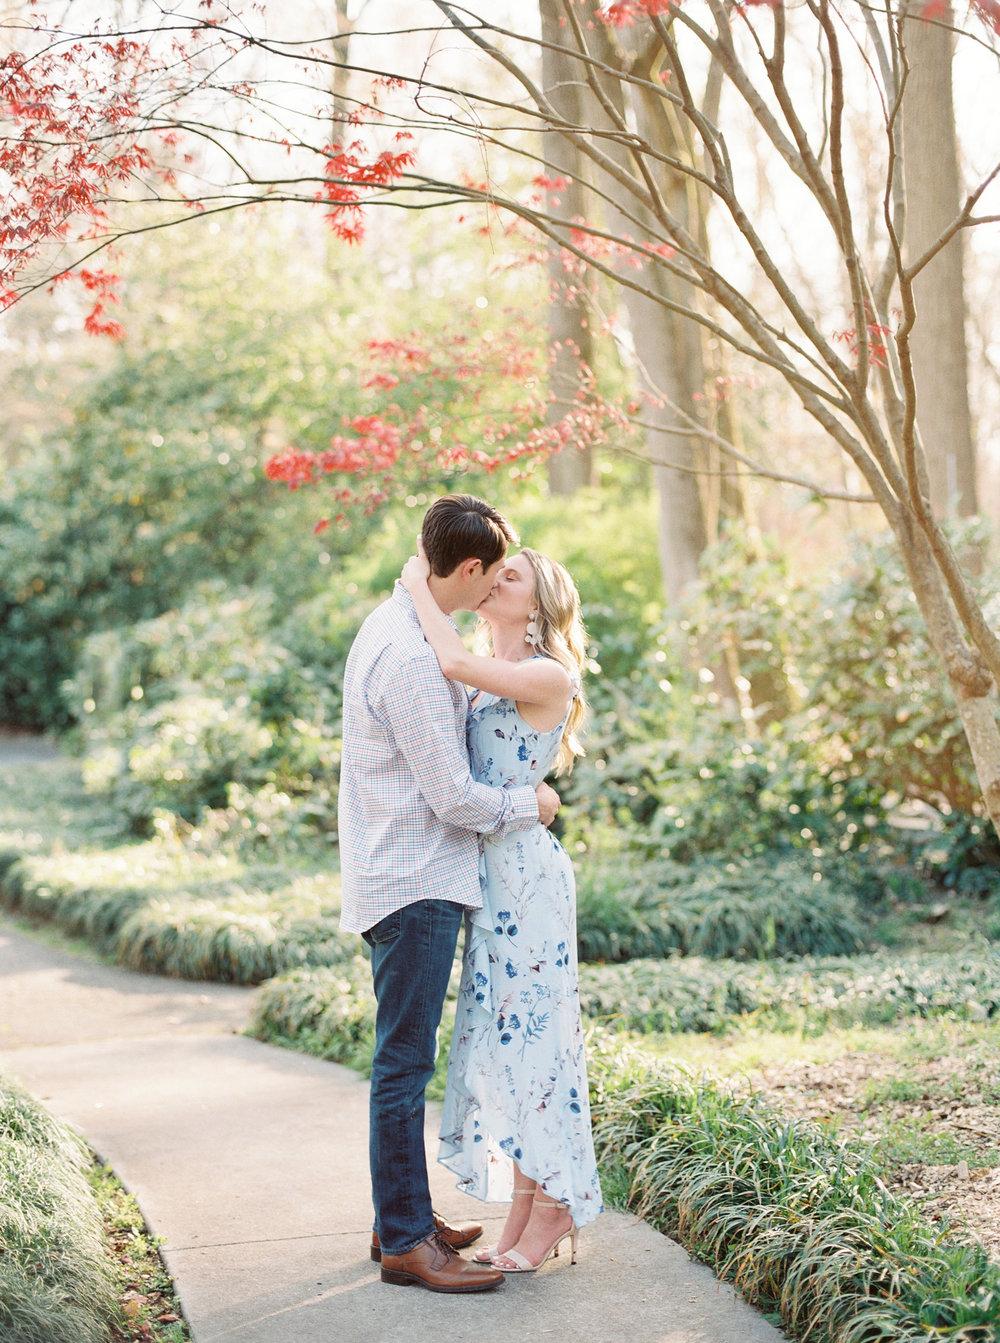 hannah forsberg atlanta wedding photographer cator woolford gardens engagement pictures14.JPG